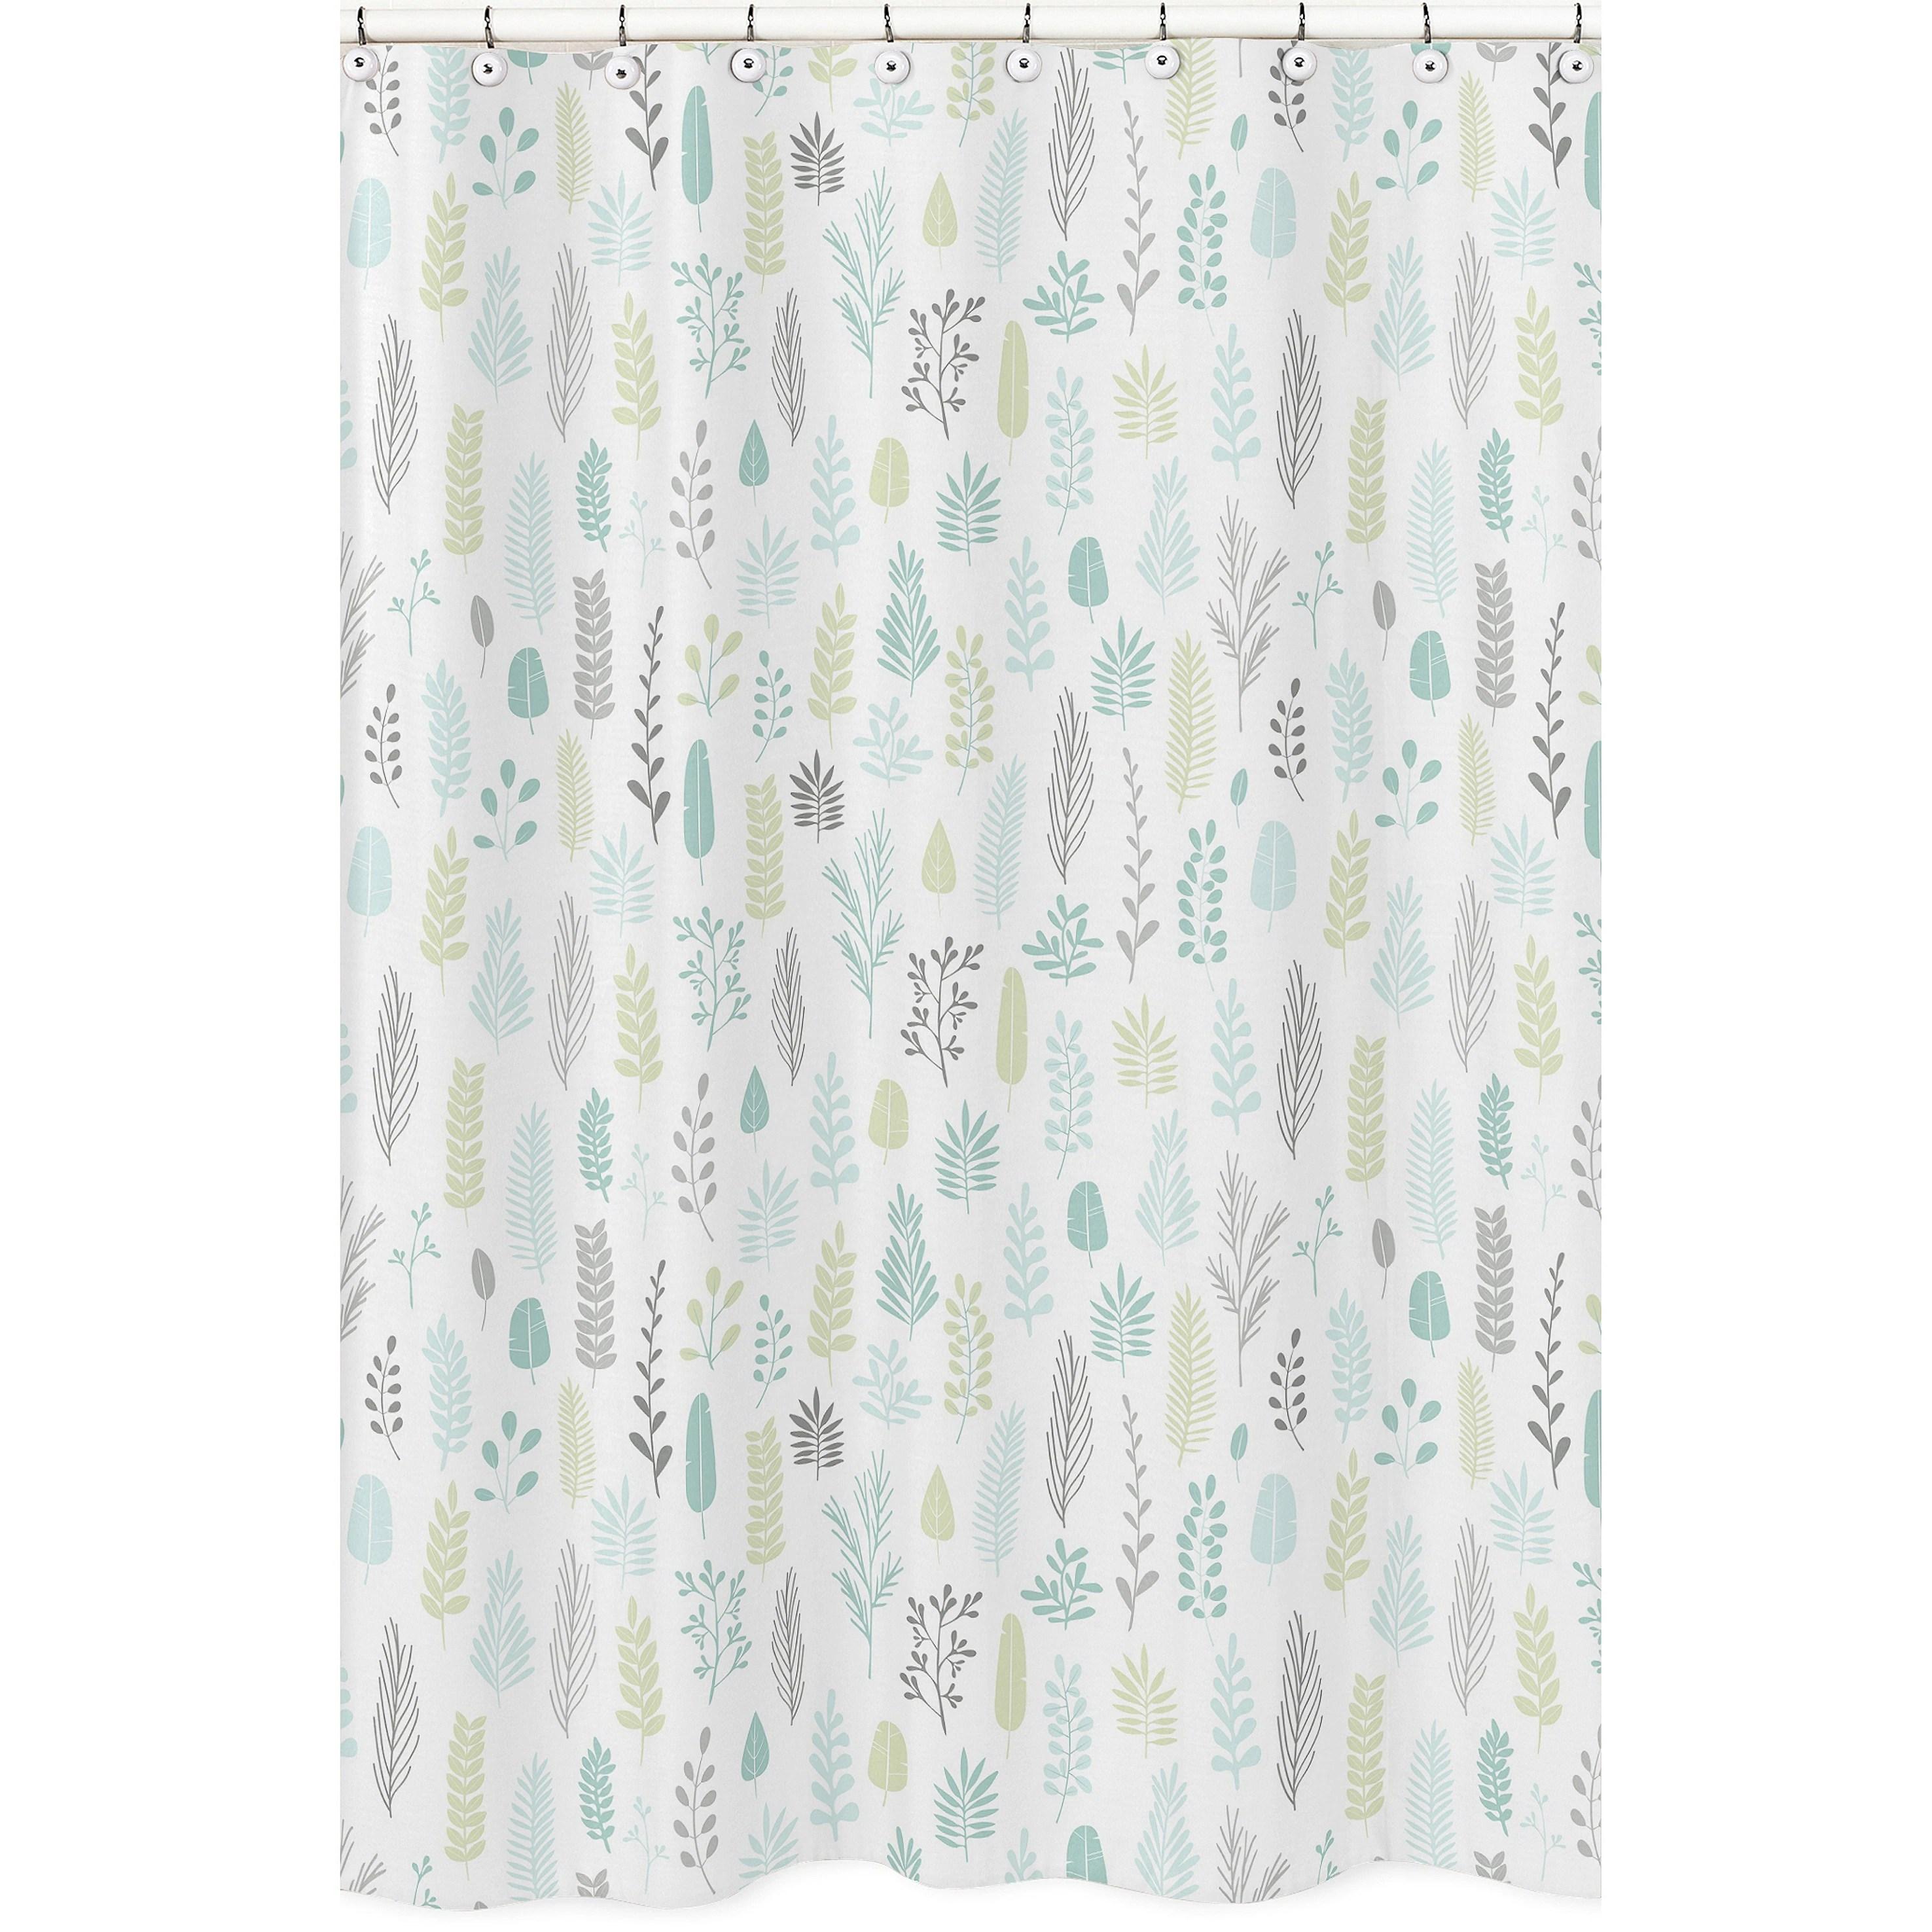 sweet jojo designs blue grey tropical leaf bathroom fabric bath shower curtain turquoise gray green rainforest jungle sloth